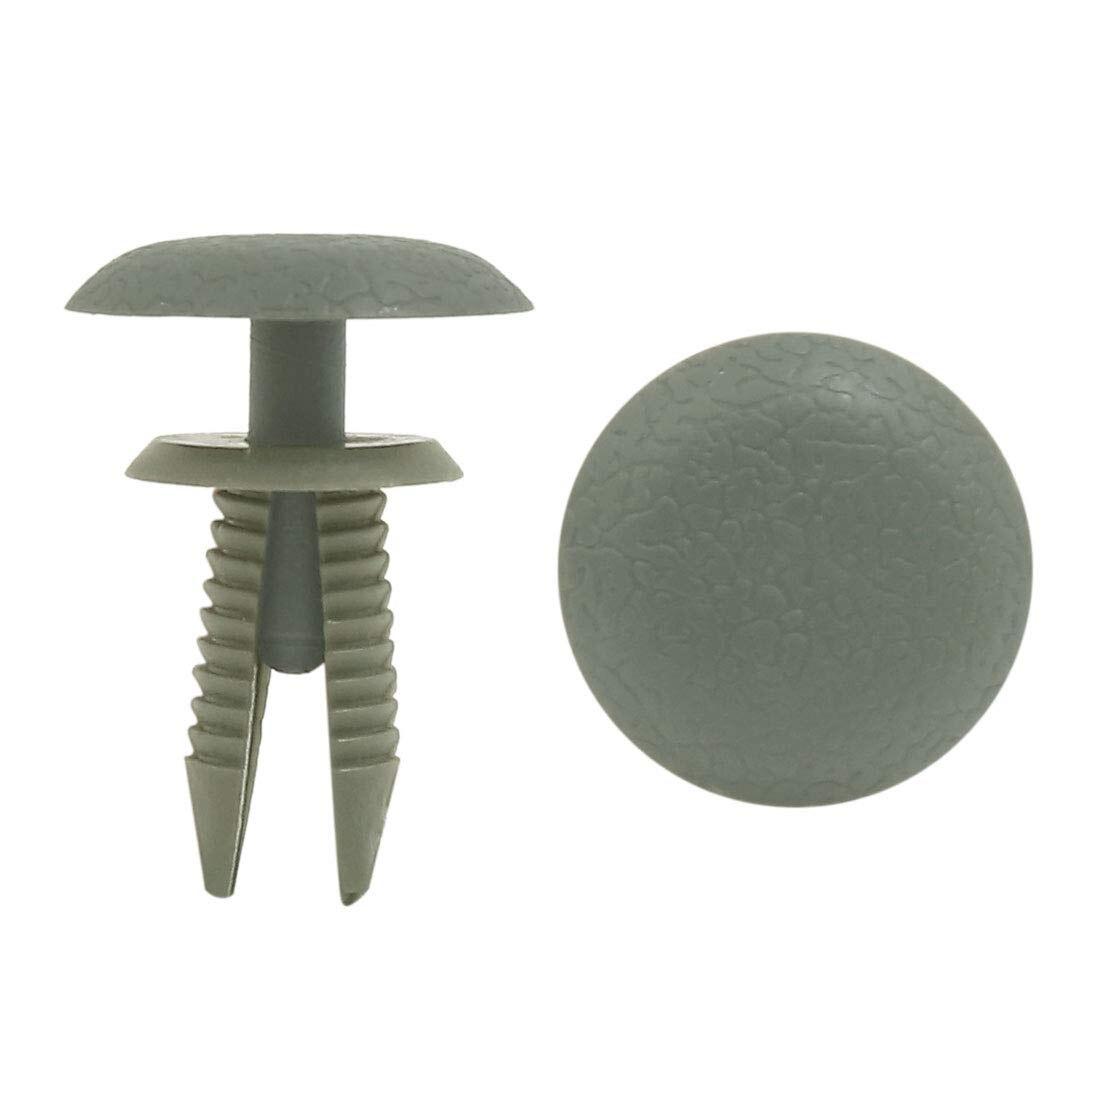 sourcingmap 50Pcs 6mm Hole Dia Fastener Door Retainer Clip Rivet Bumper Pin